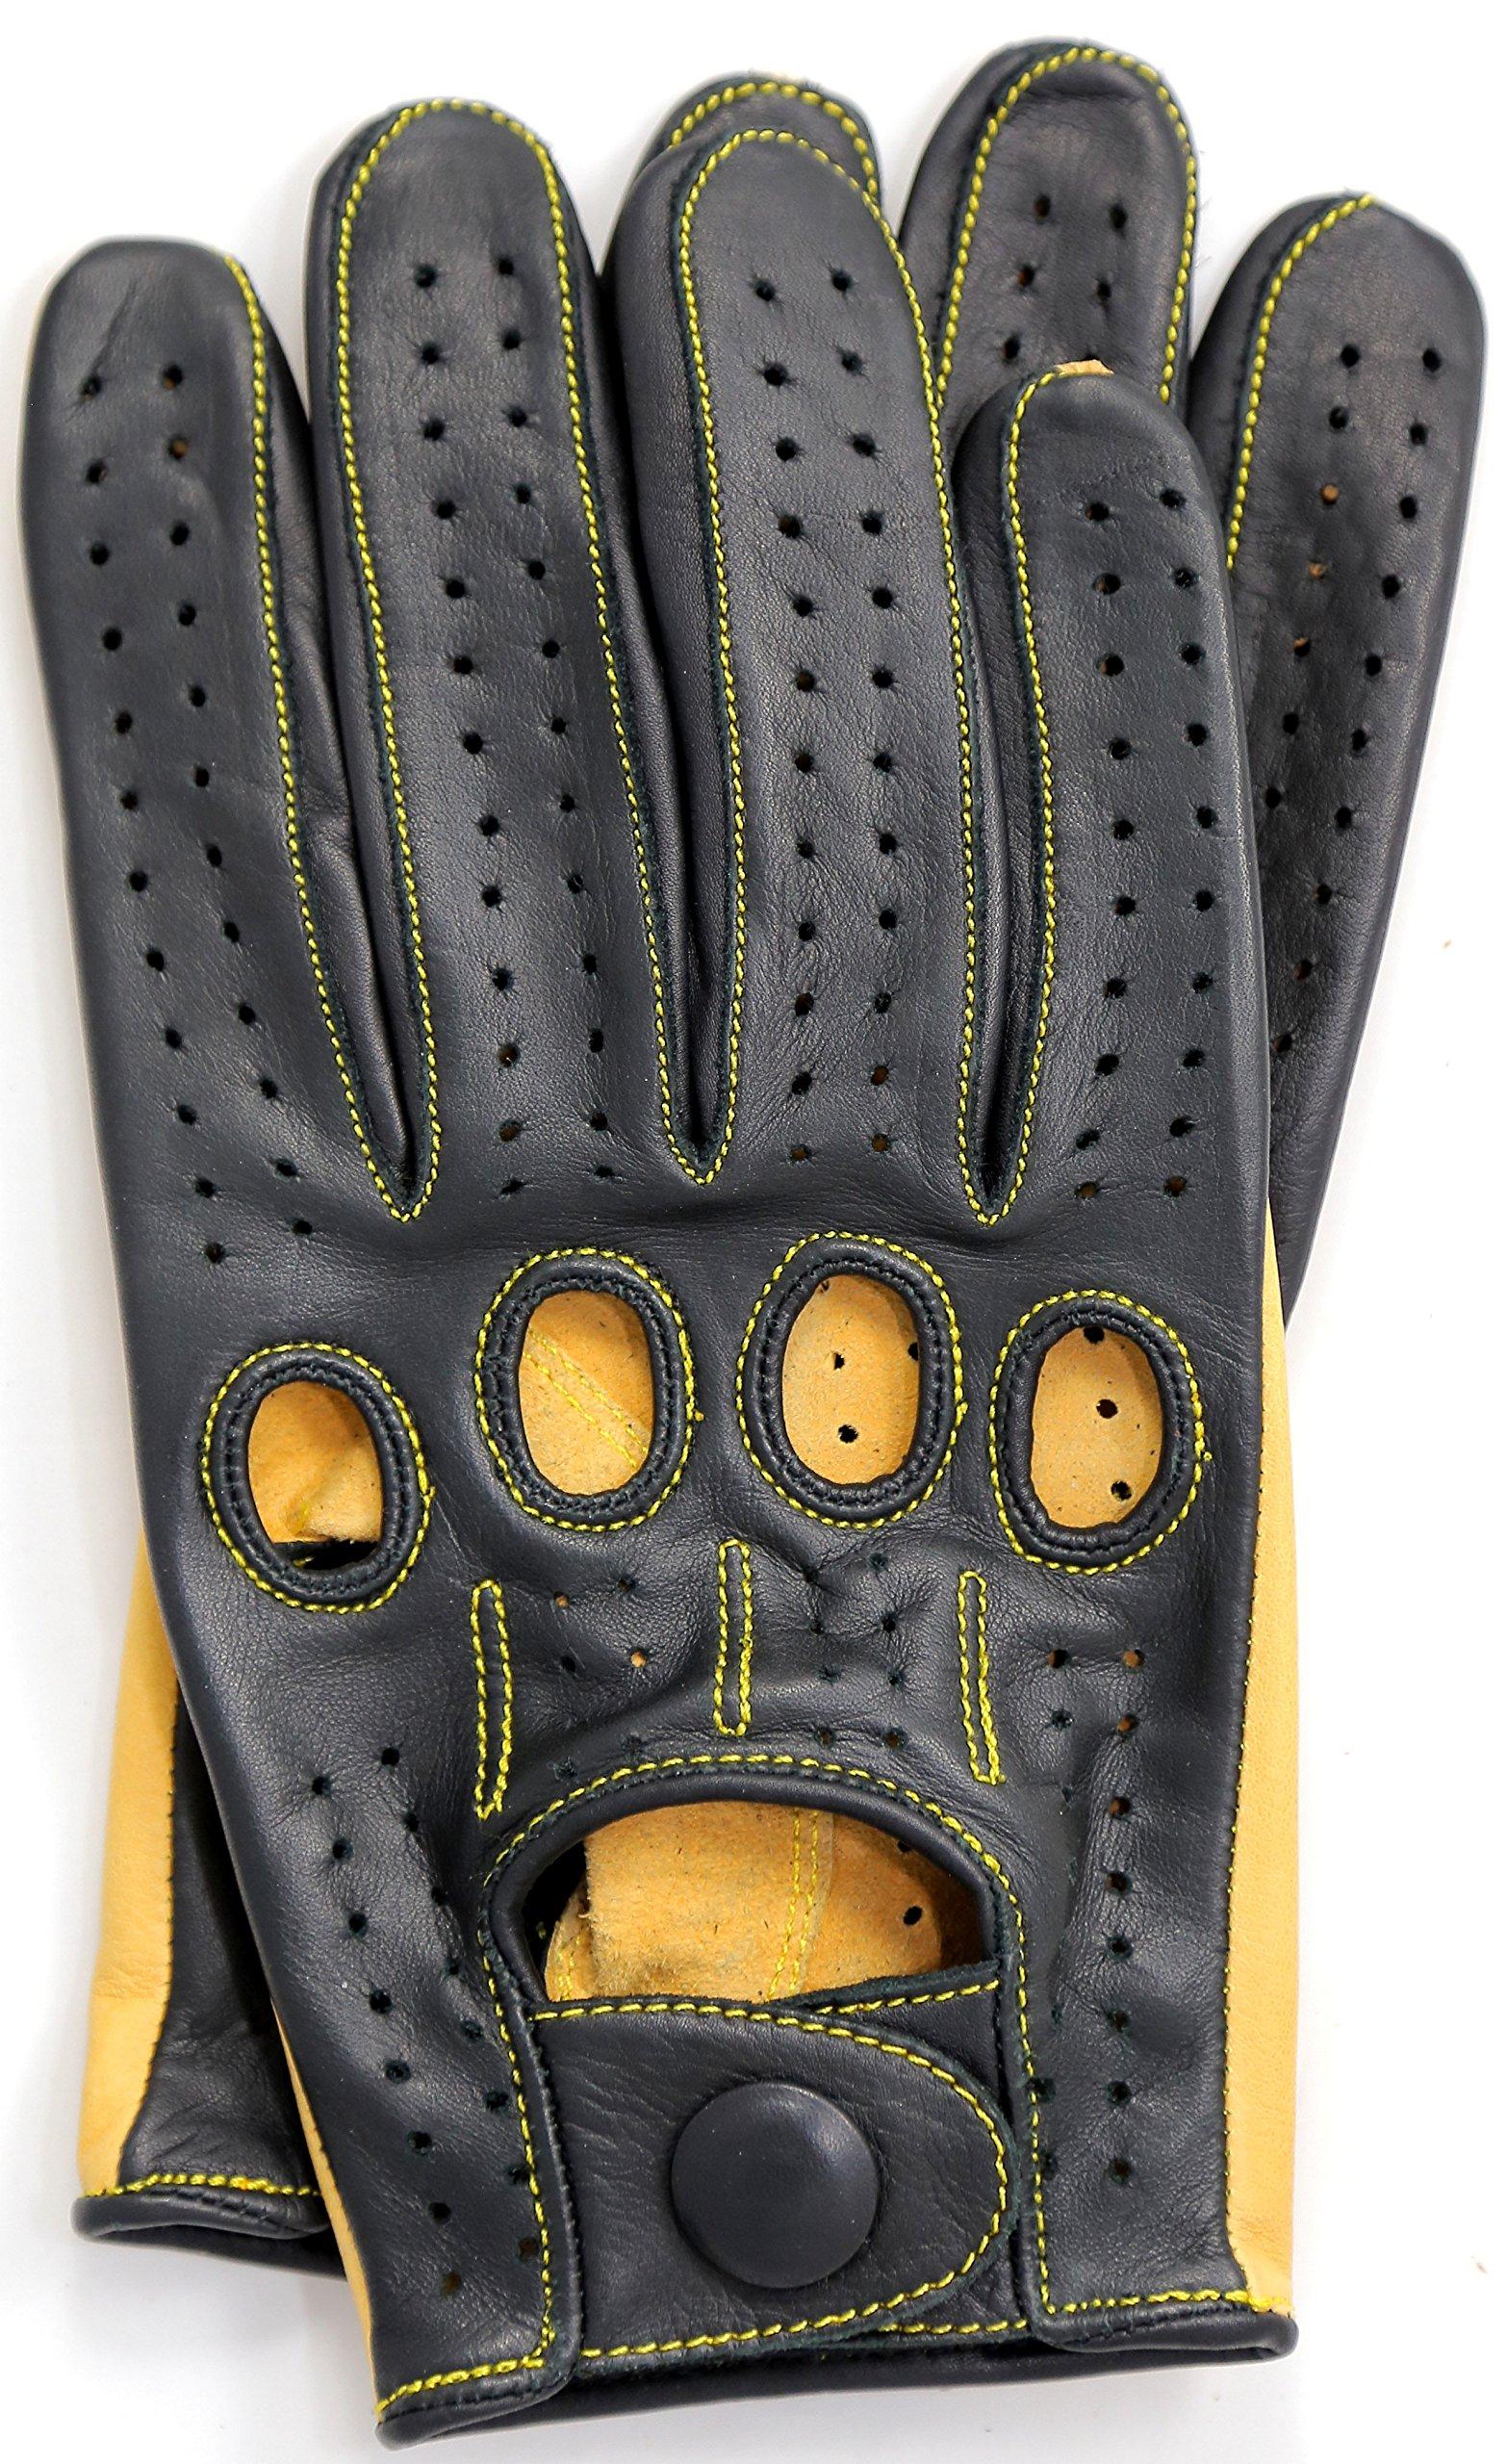 Riparo Genuine Kangaroo Leather Full-finger Driving Gloves (X-Large, Black/Camel)